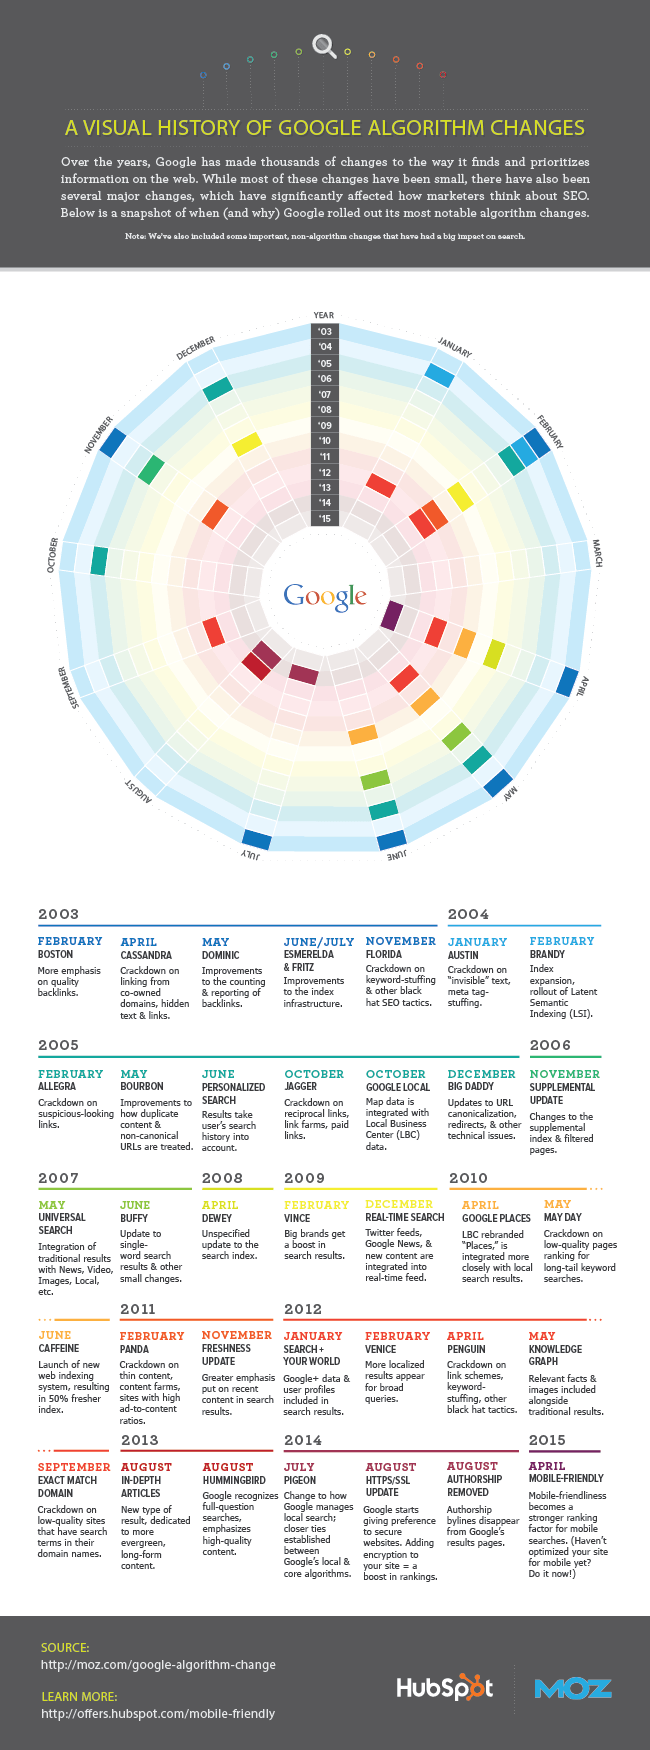 history of google algorithm changes